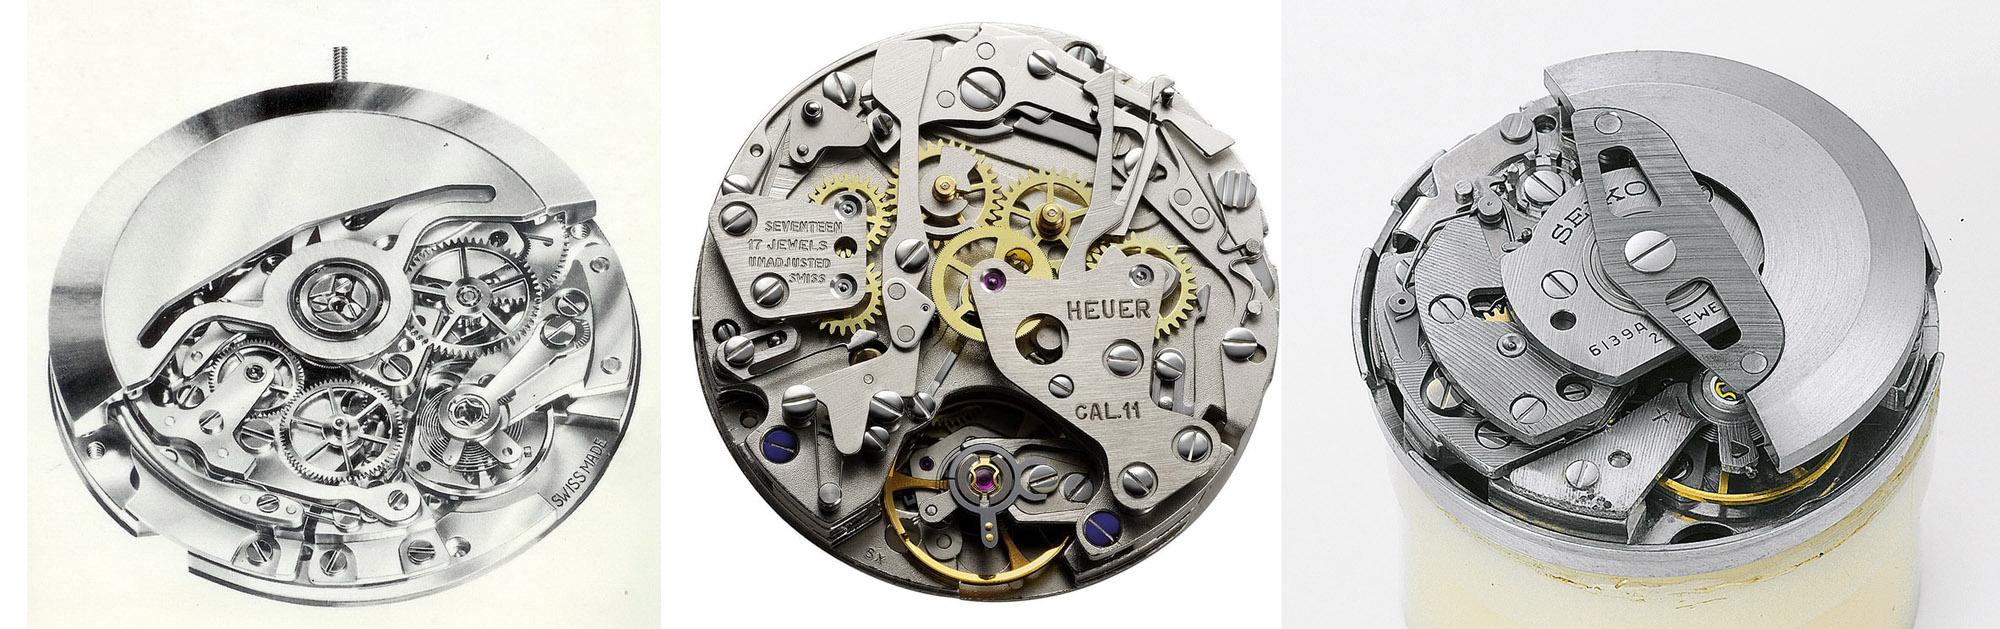 First automatic Chronographs Zenith 400 Buren Cal. 11 Seiko 6139